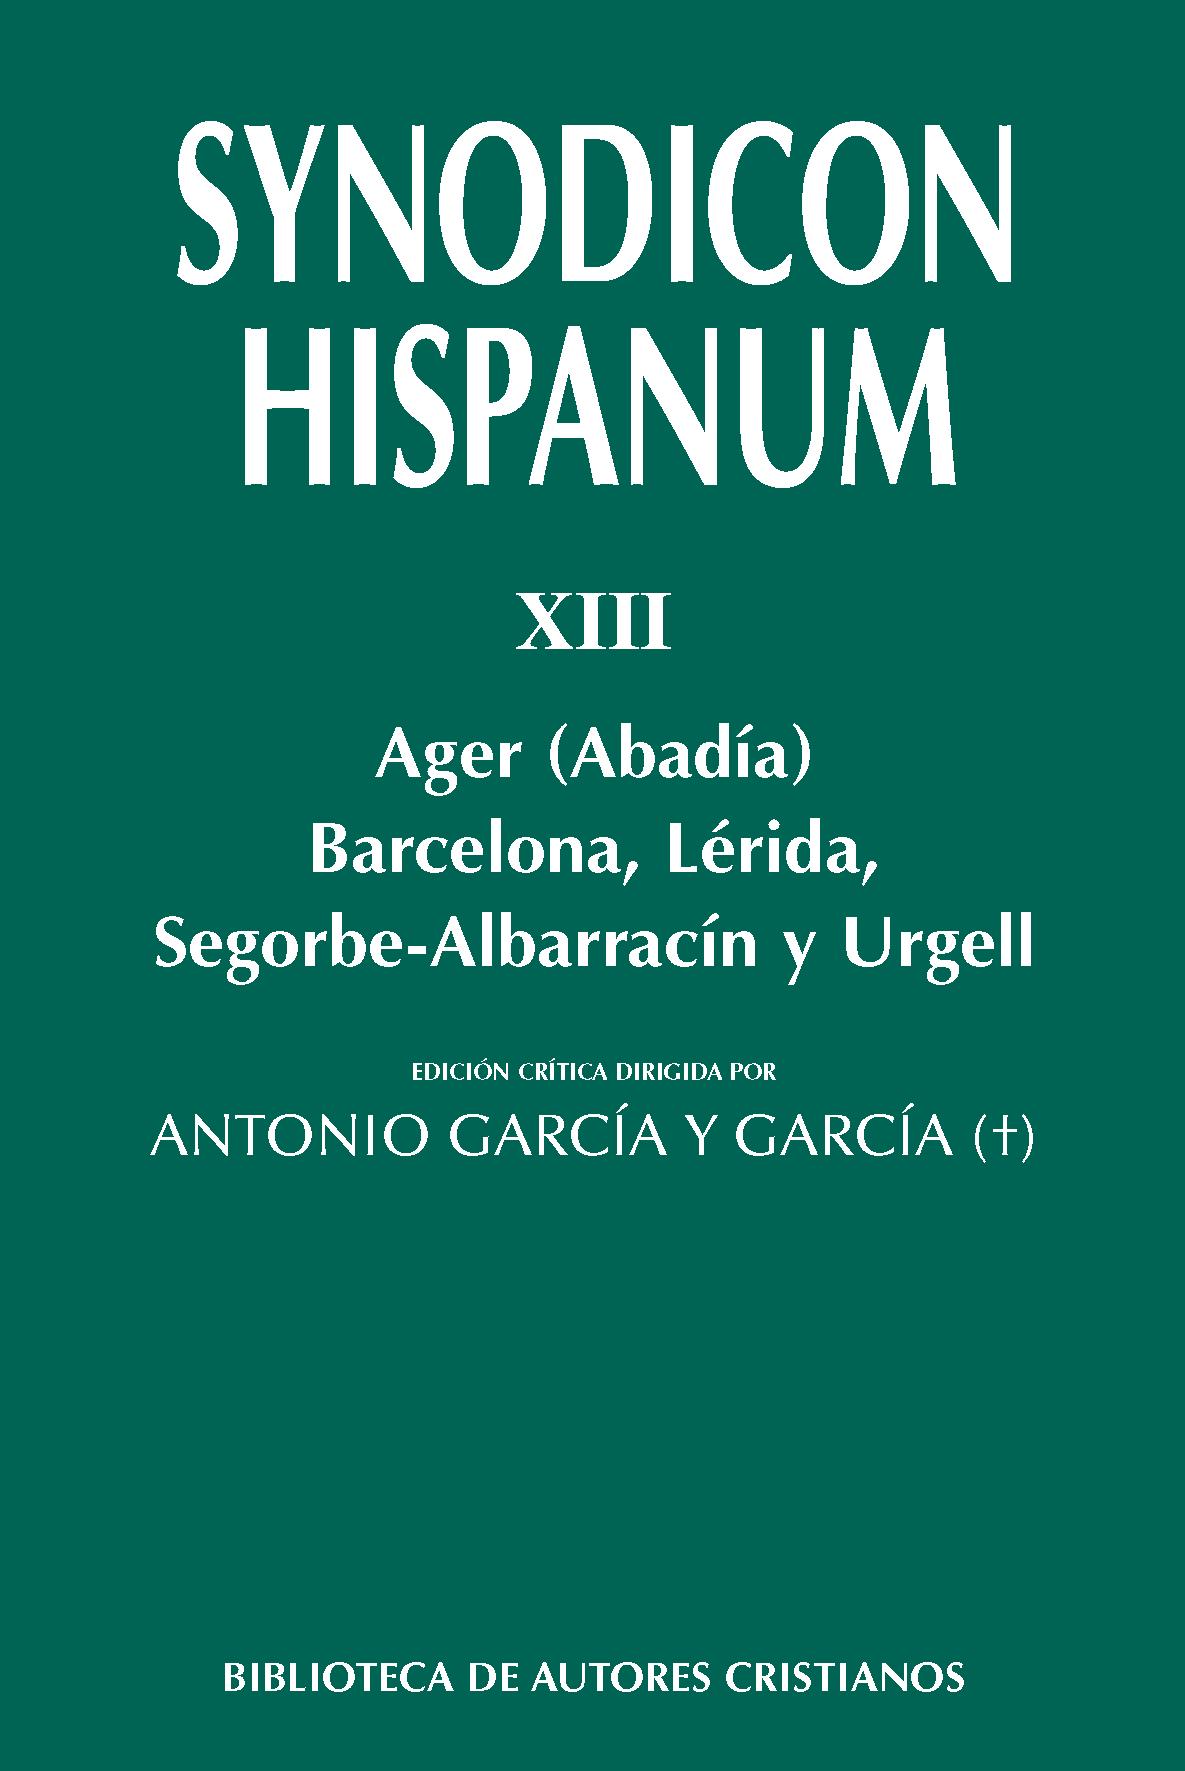 Libro. Synodicum hispanum, XIII